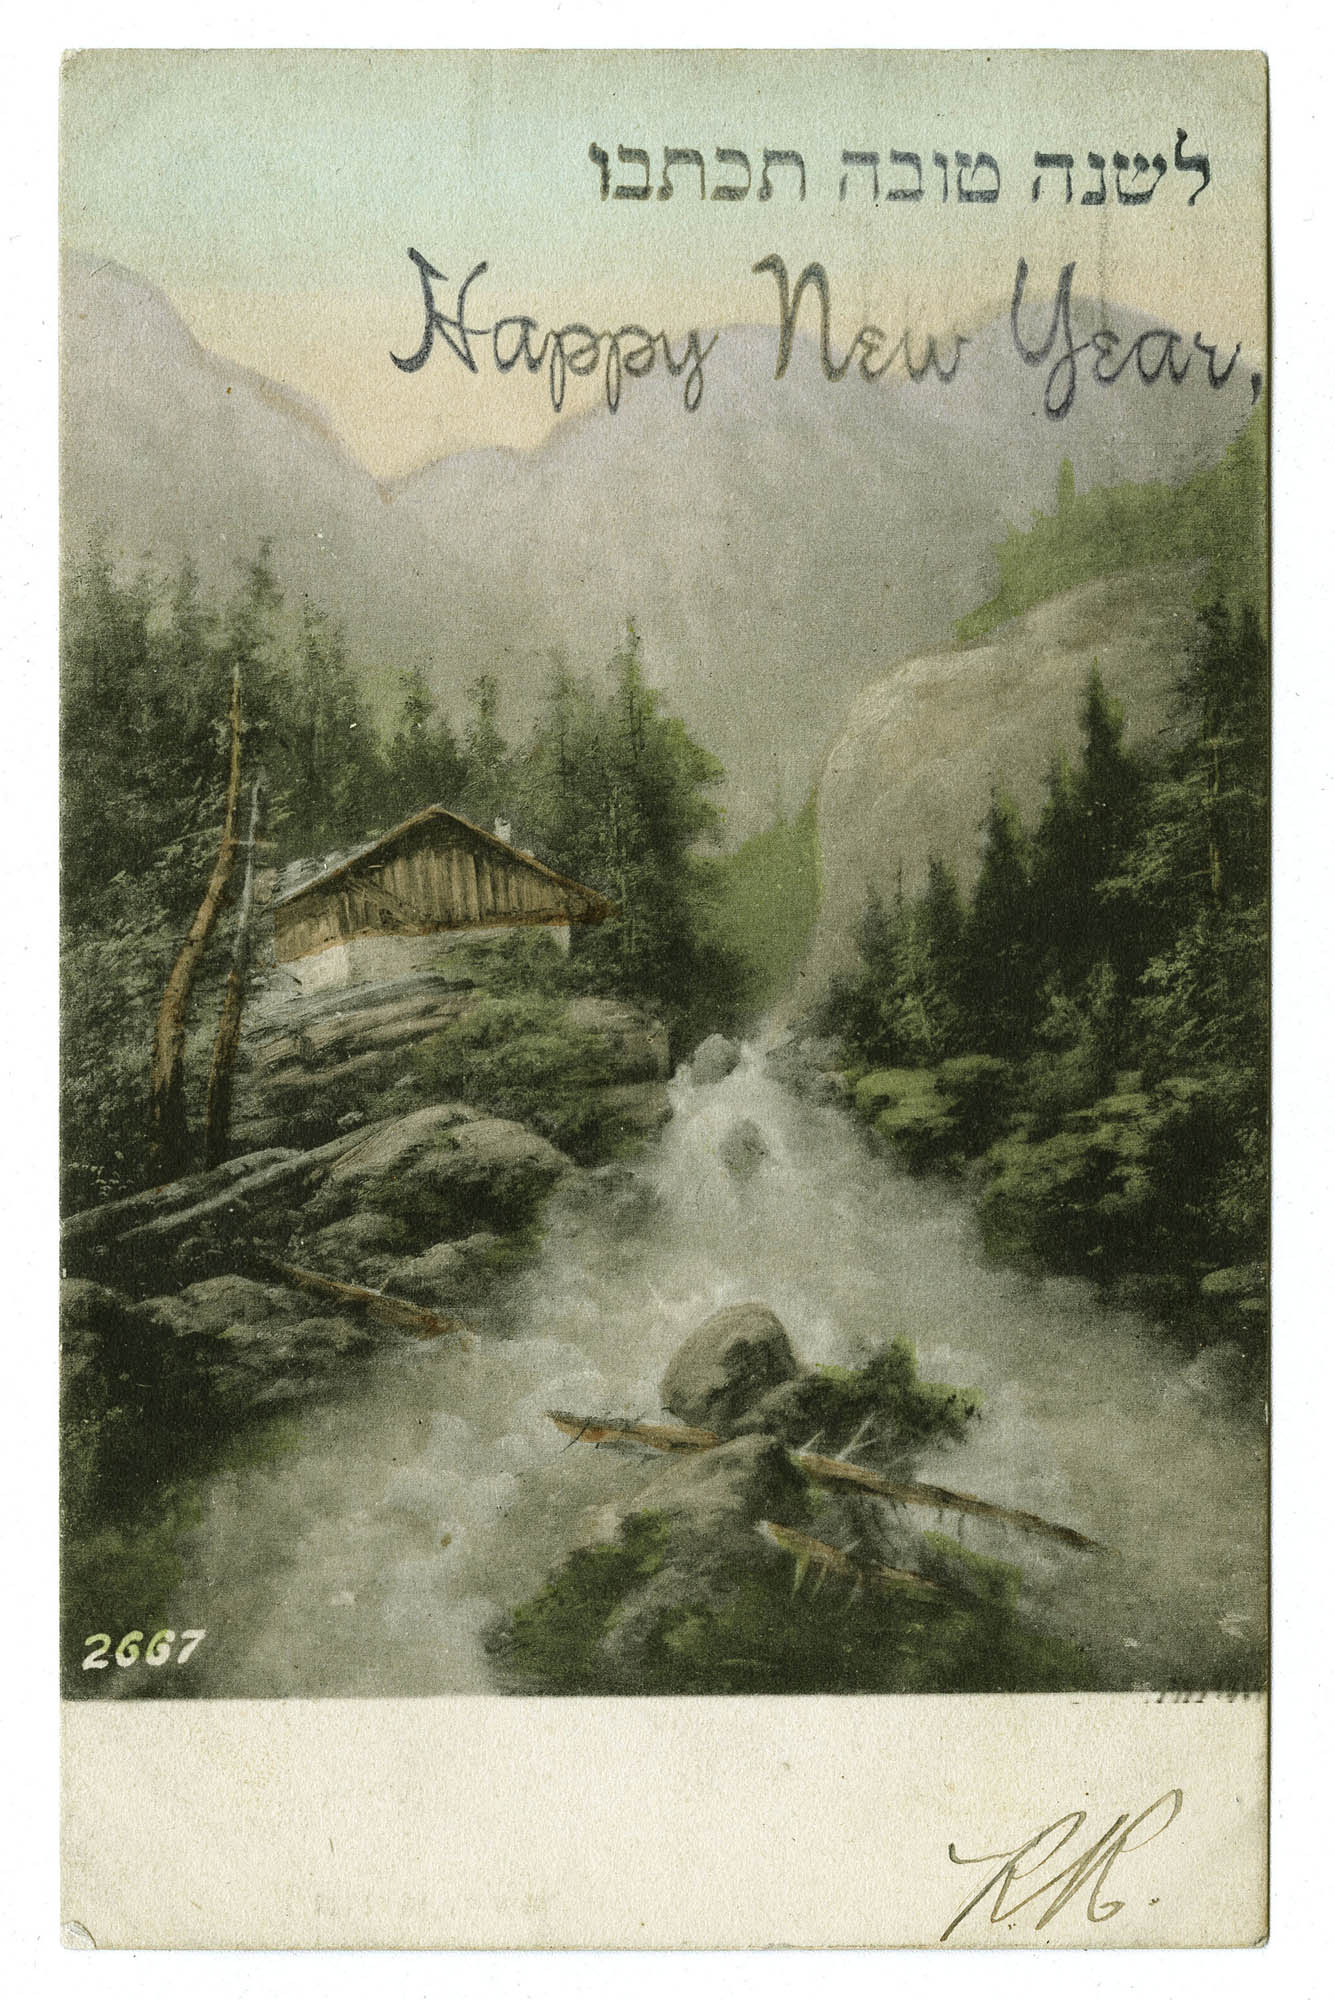 Happy New Year / לשנה טובה תכתבו